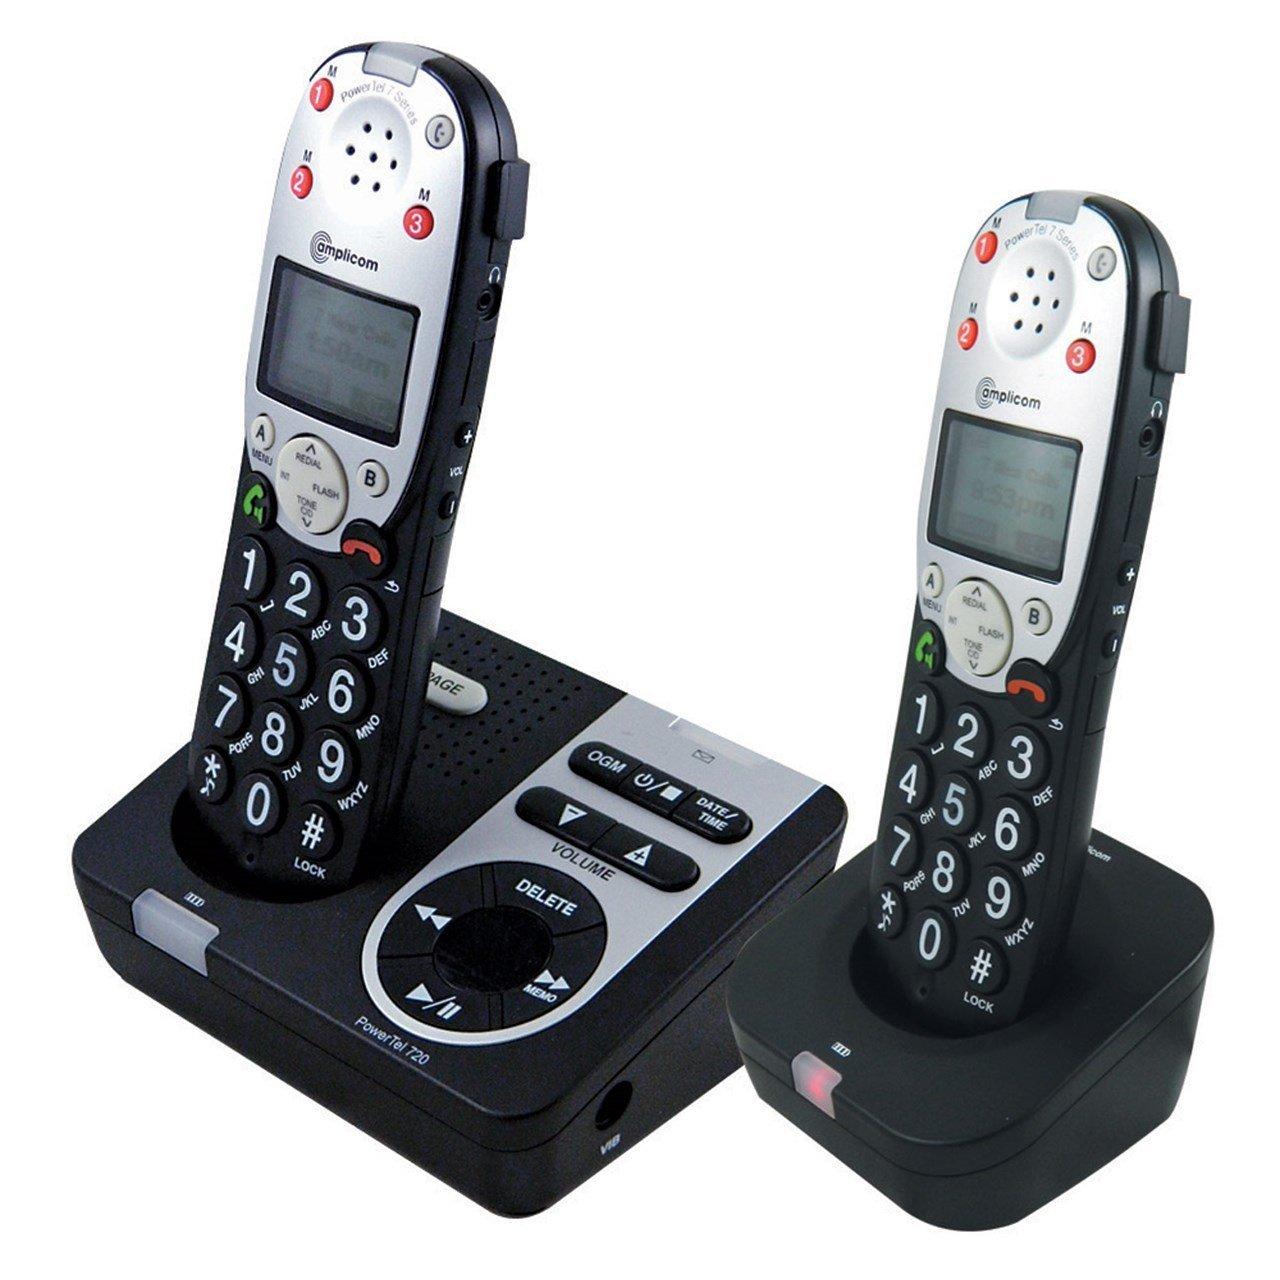 Amplicom 95619 PowerTel 720 Assure Plus Twin Amplified Phone